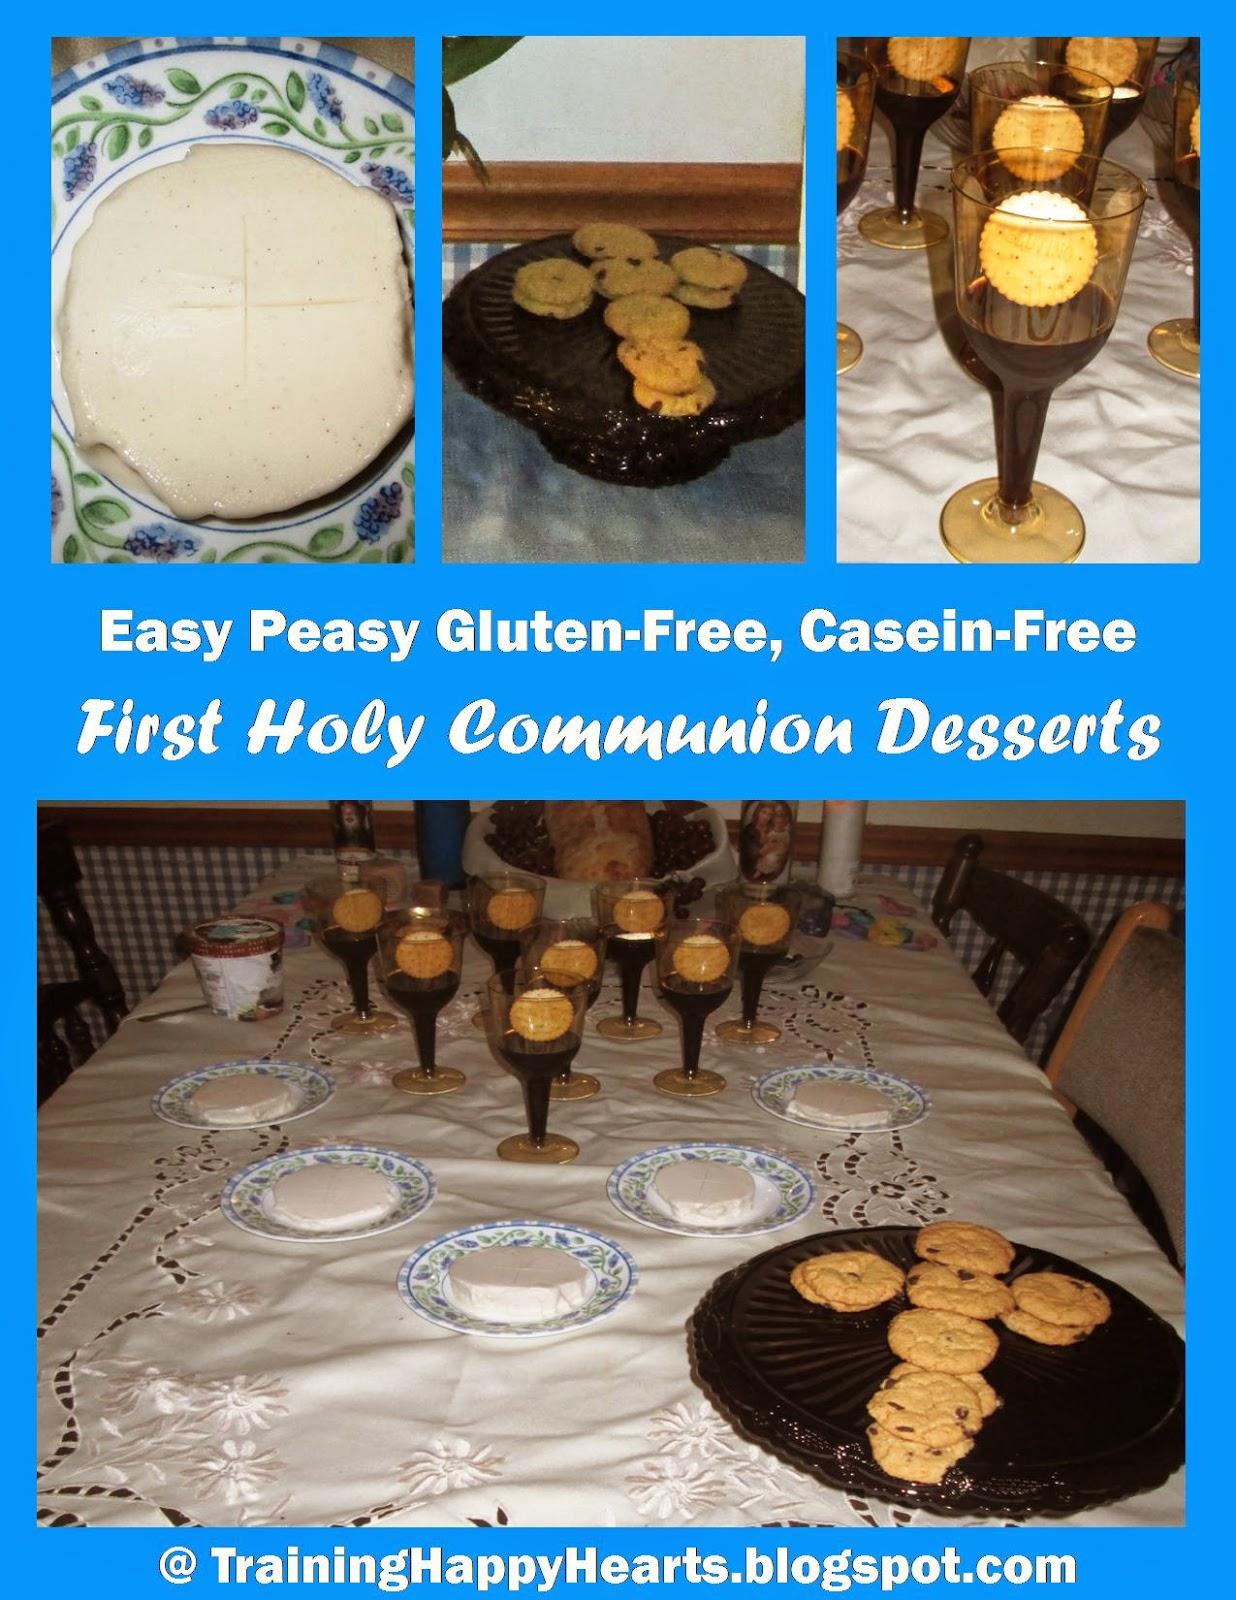 http://traininghappyhearts.blogspot.com/2014/05/no-fuss-gfcf-first-holy-communion.html